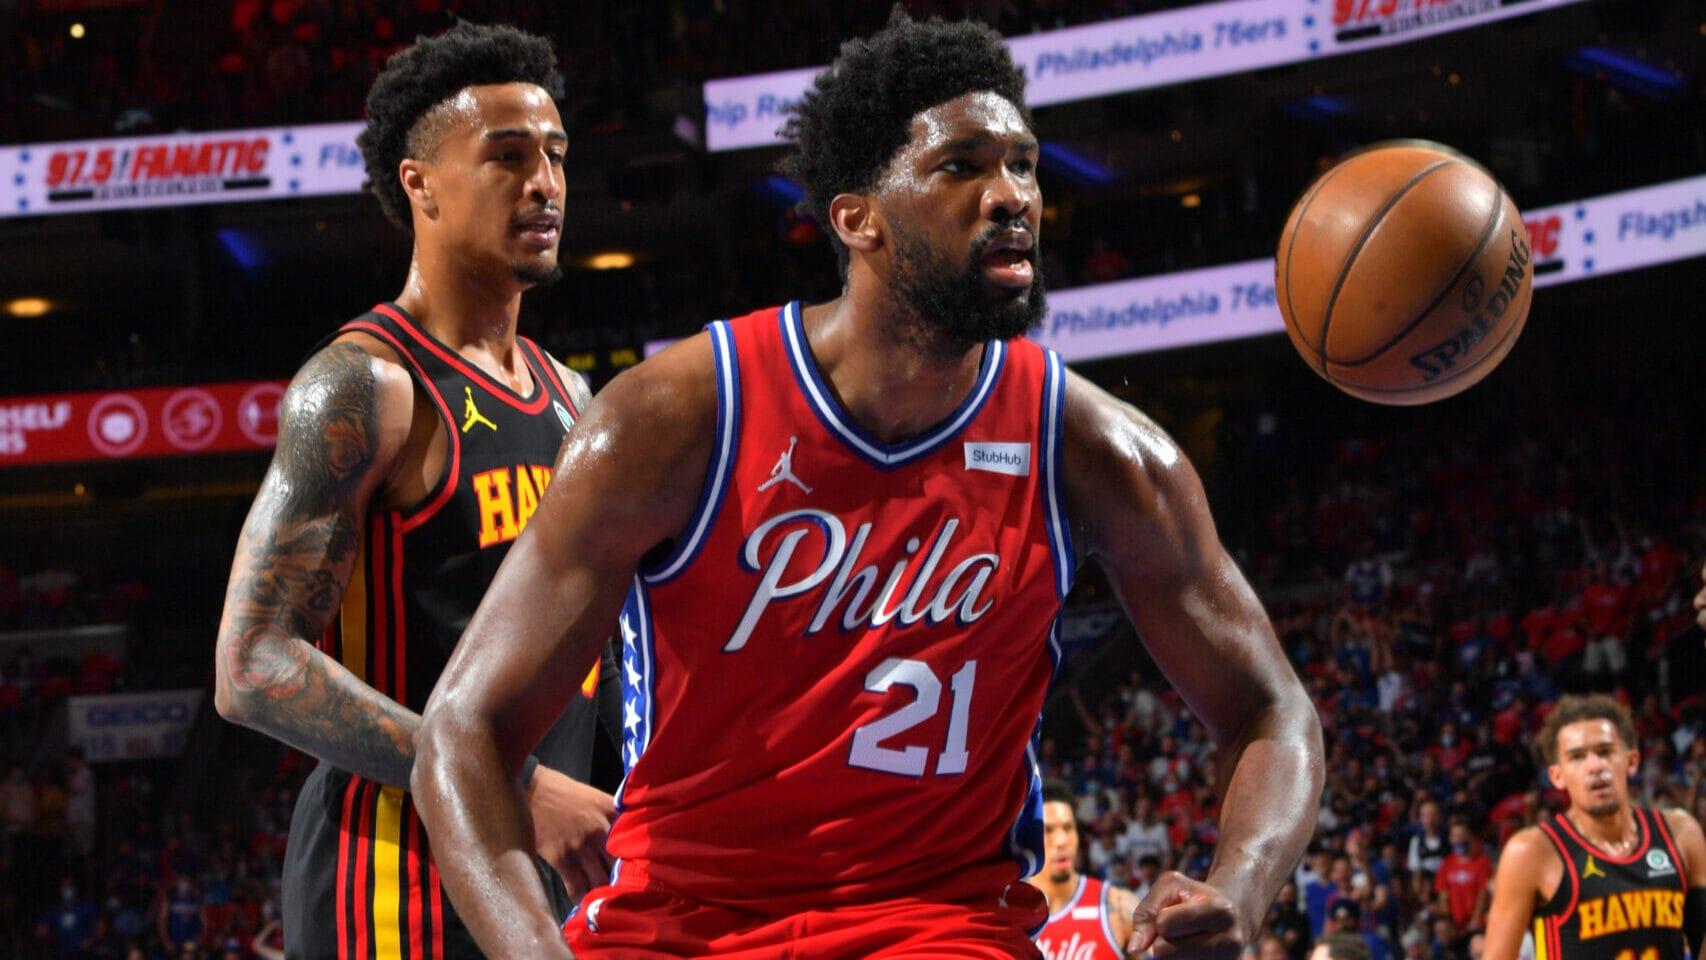 Hawks remain confident vs. 76ers despite Embiid's dominance